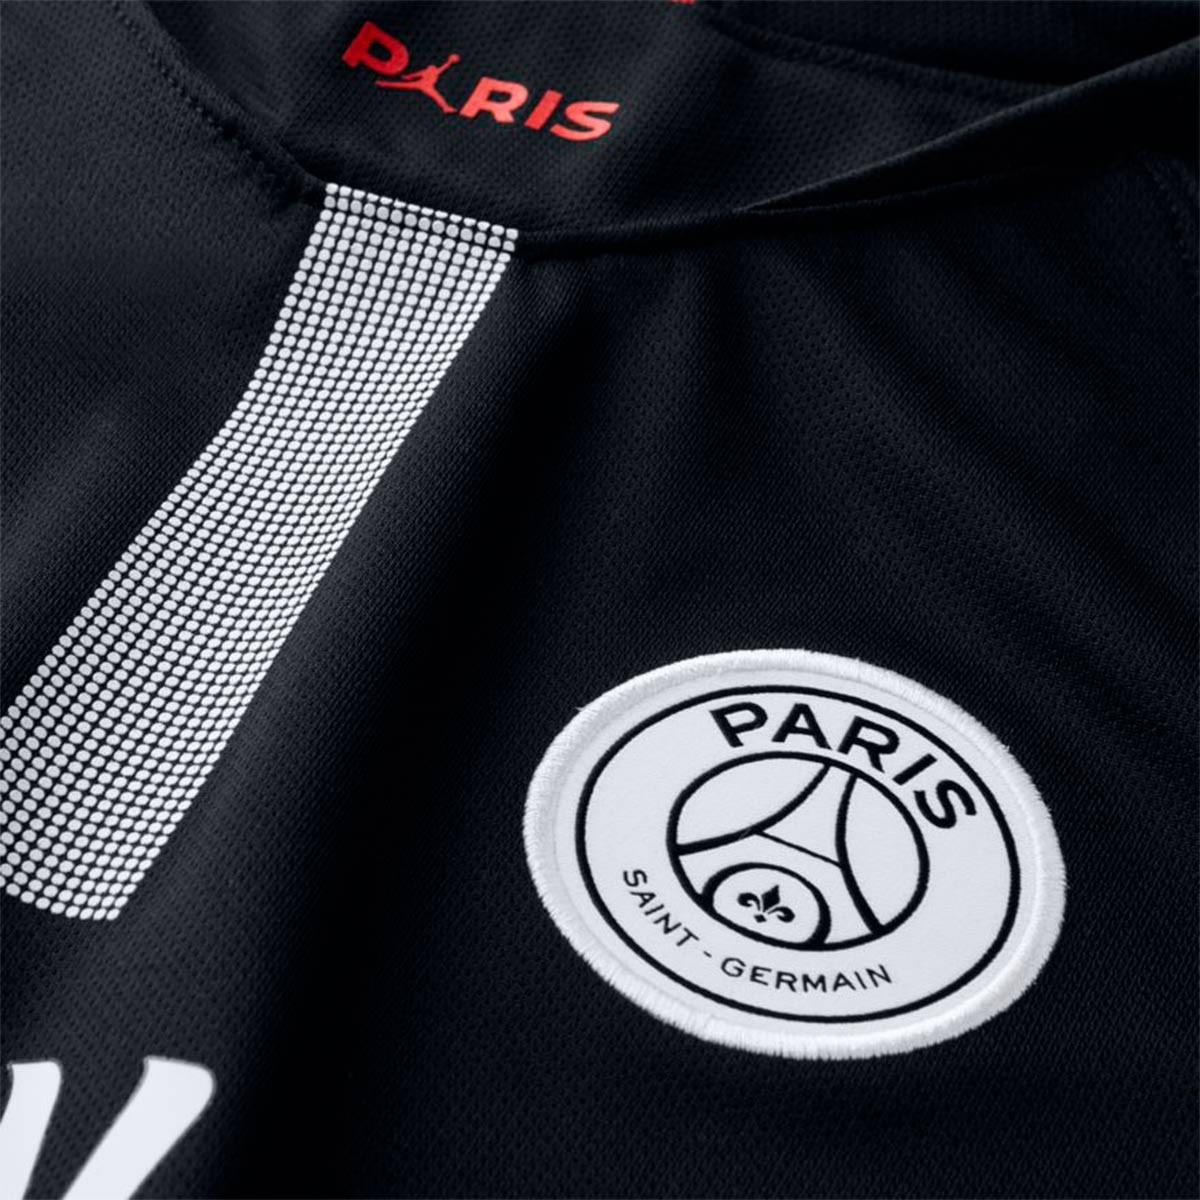 Jersey Nike Kids Paris Saint-Germain Stadium 2018-2019 Third Black-White -  Soloporteros es ahora Fútbol Emotion c7cbfb3af00b5